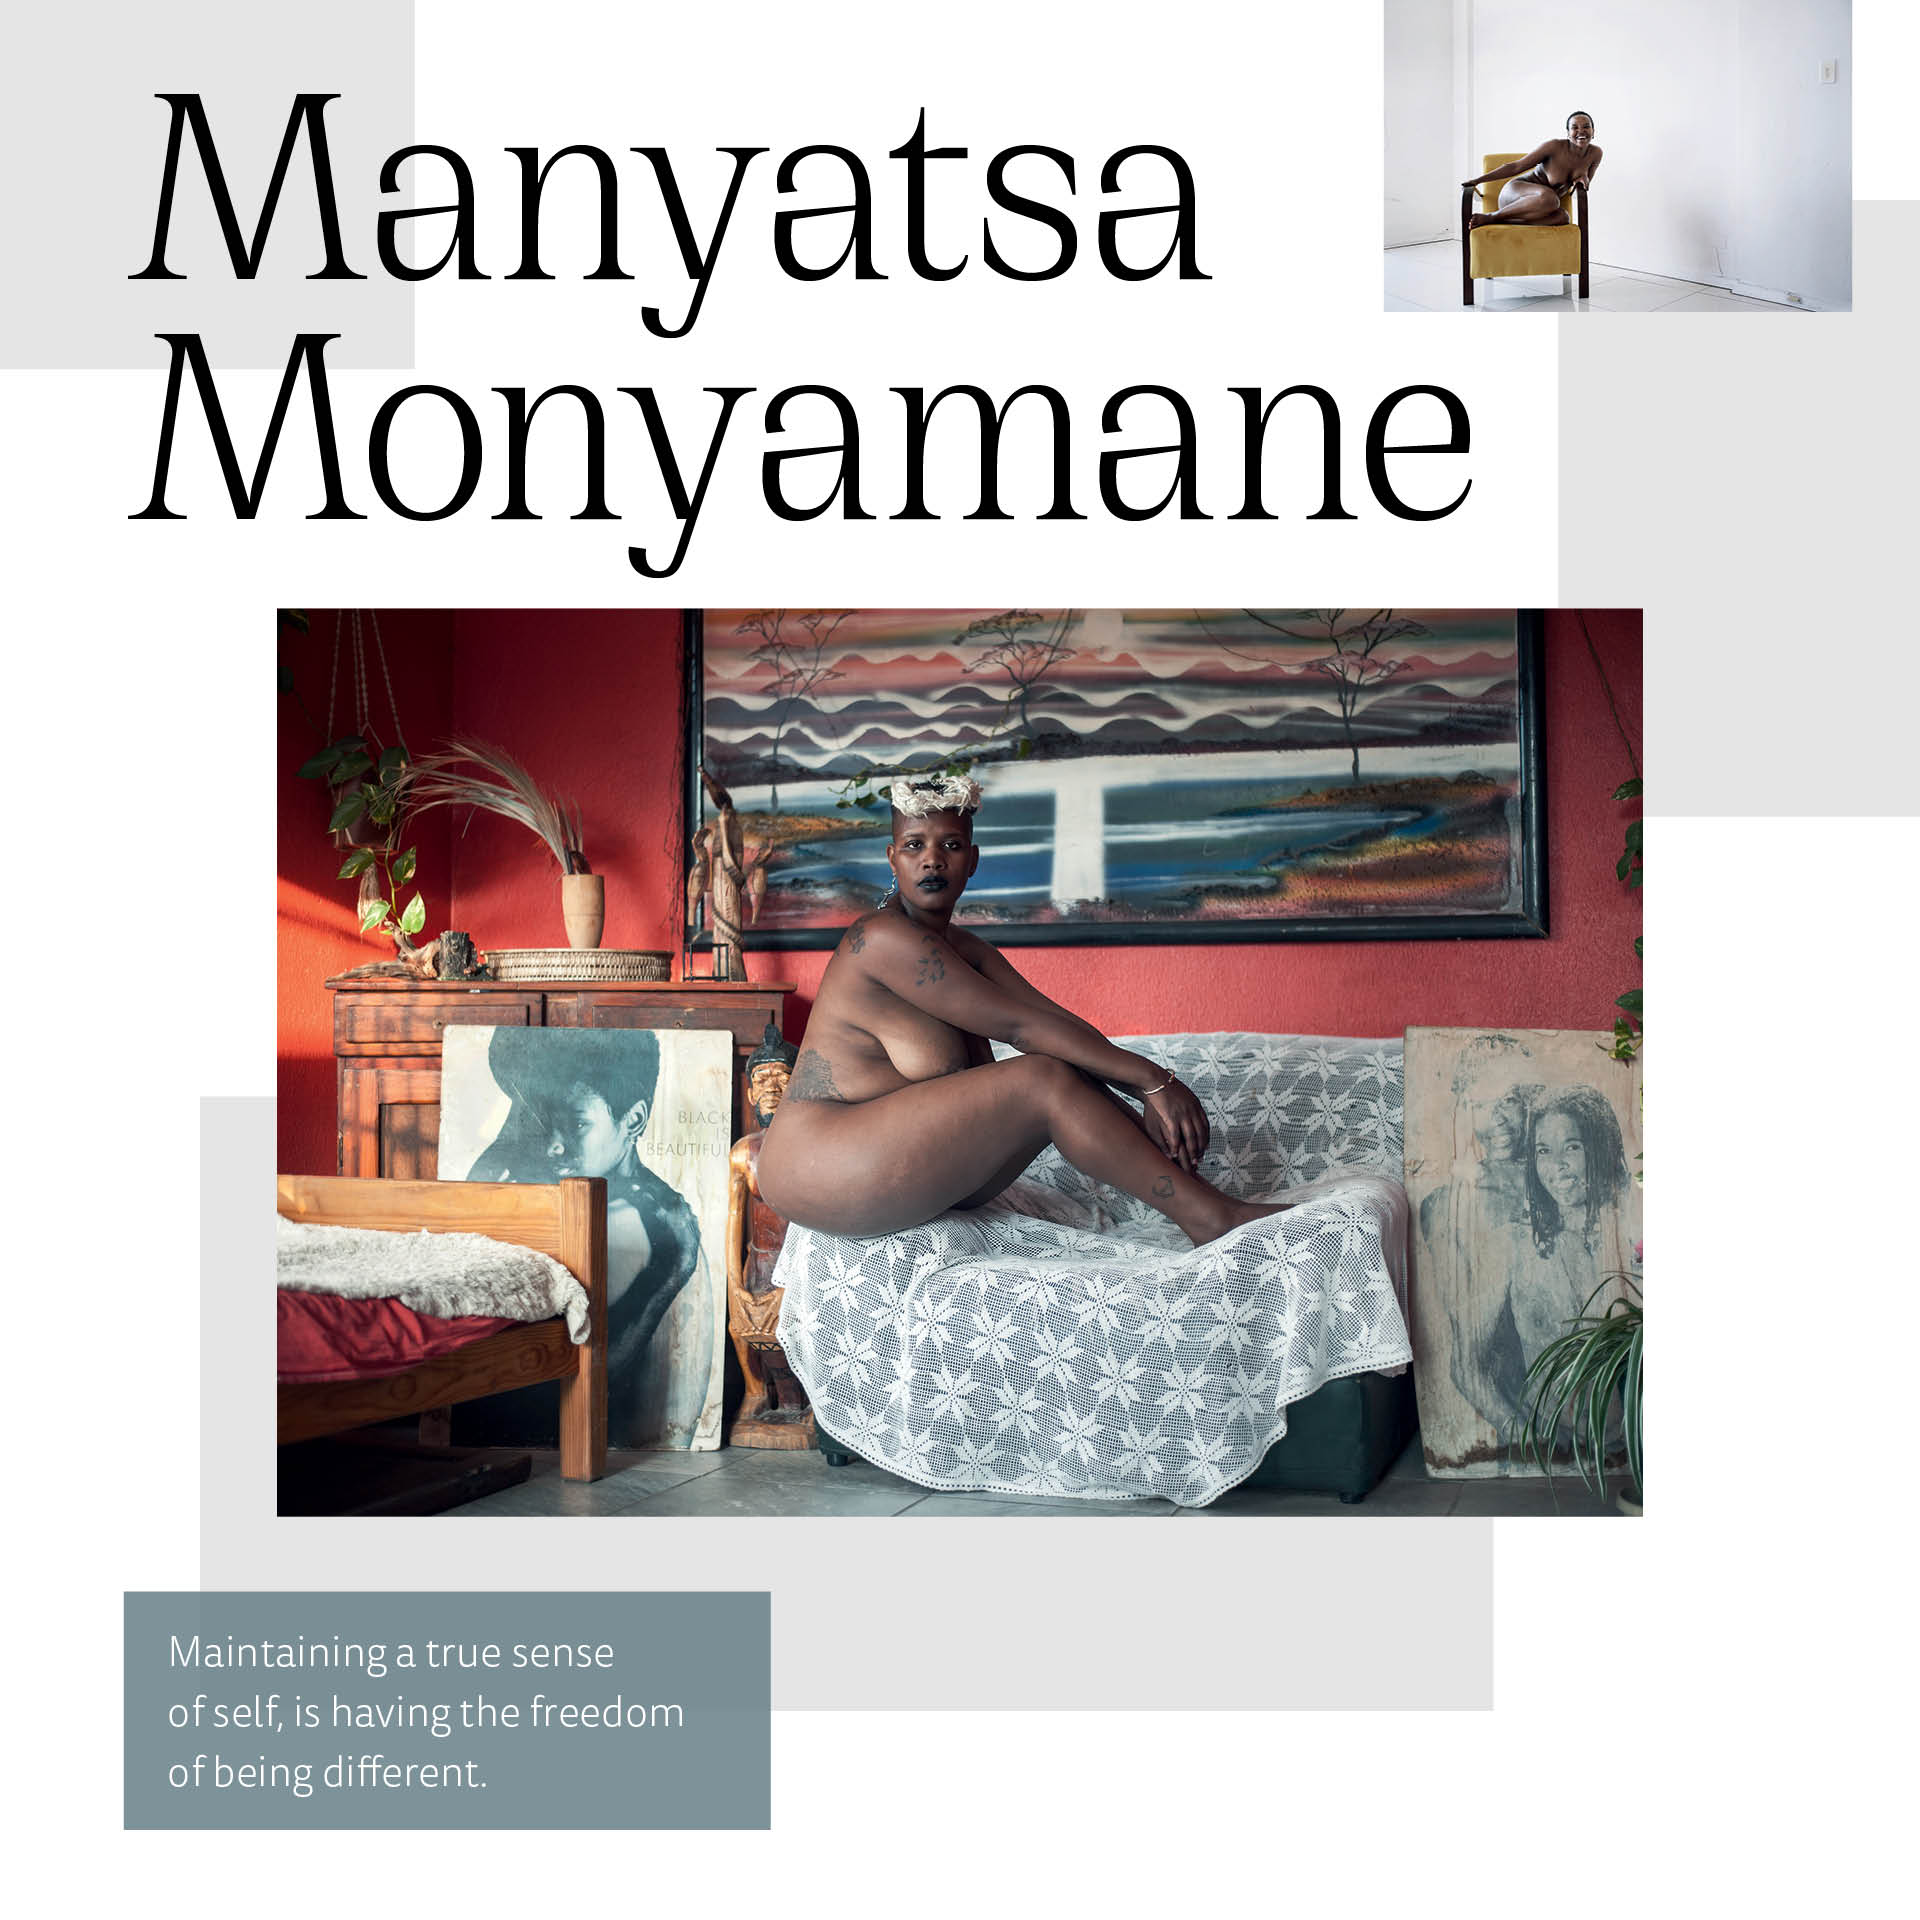 Beyond Artist Manyatsa Monyamane